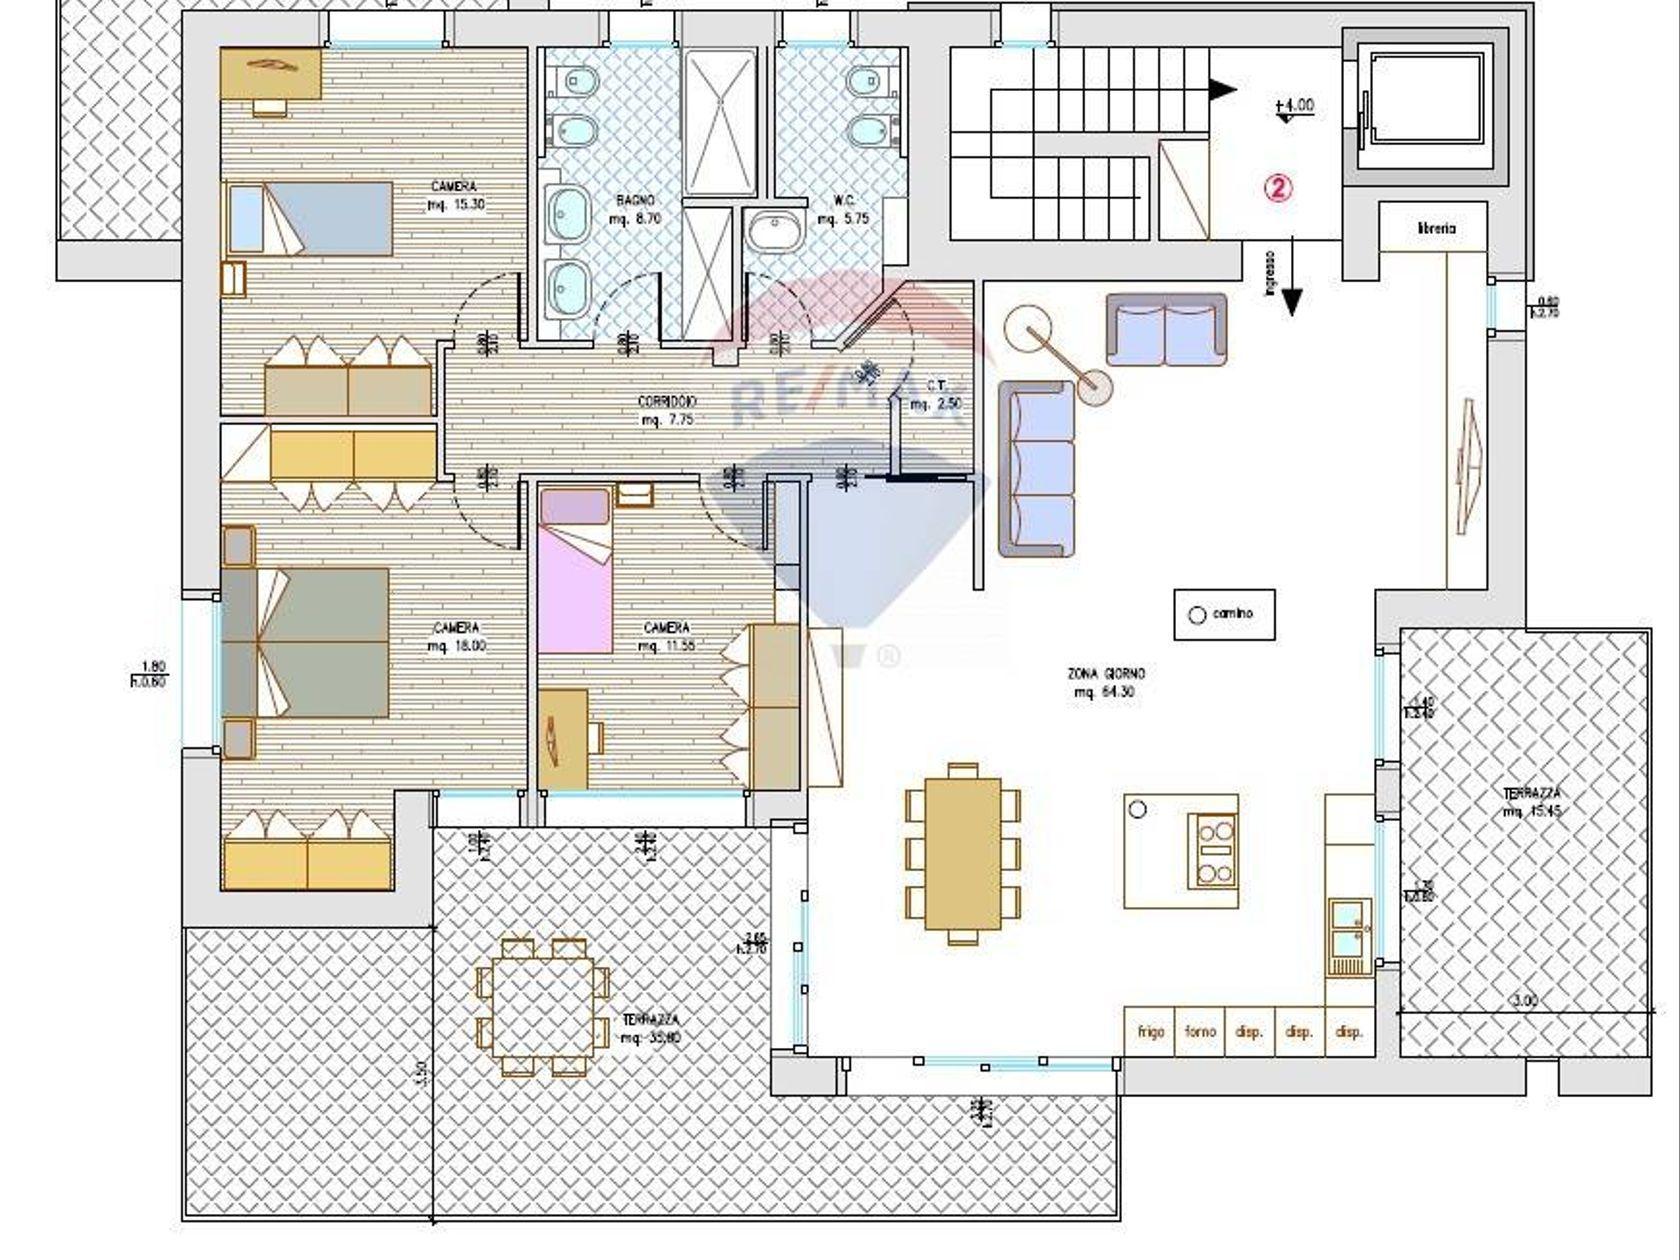 Appartamento Zanè, VI Vendita - Planimetria 2